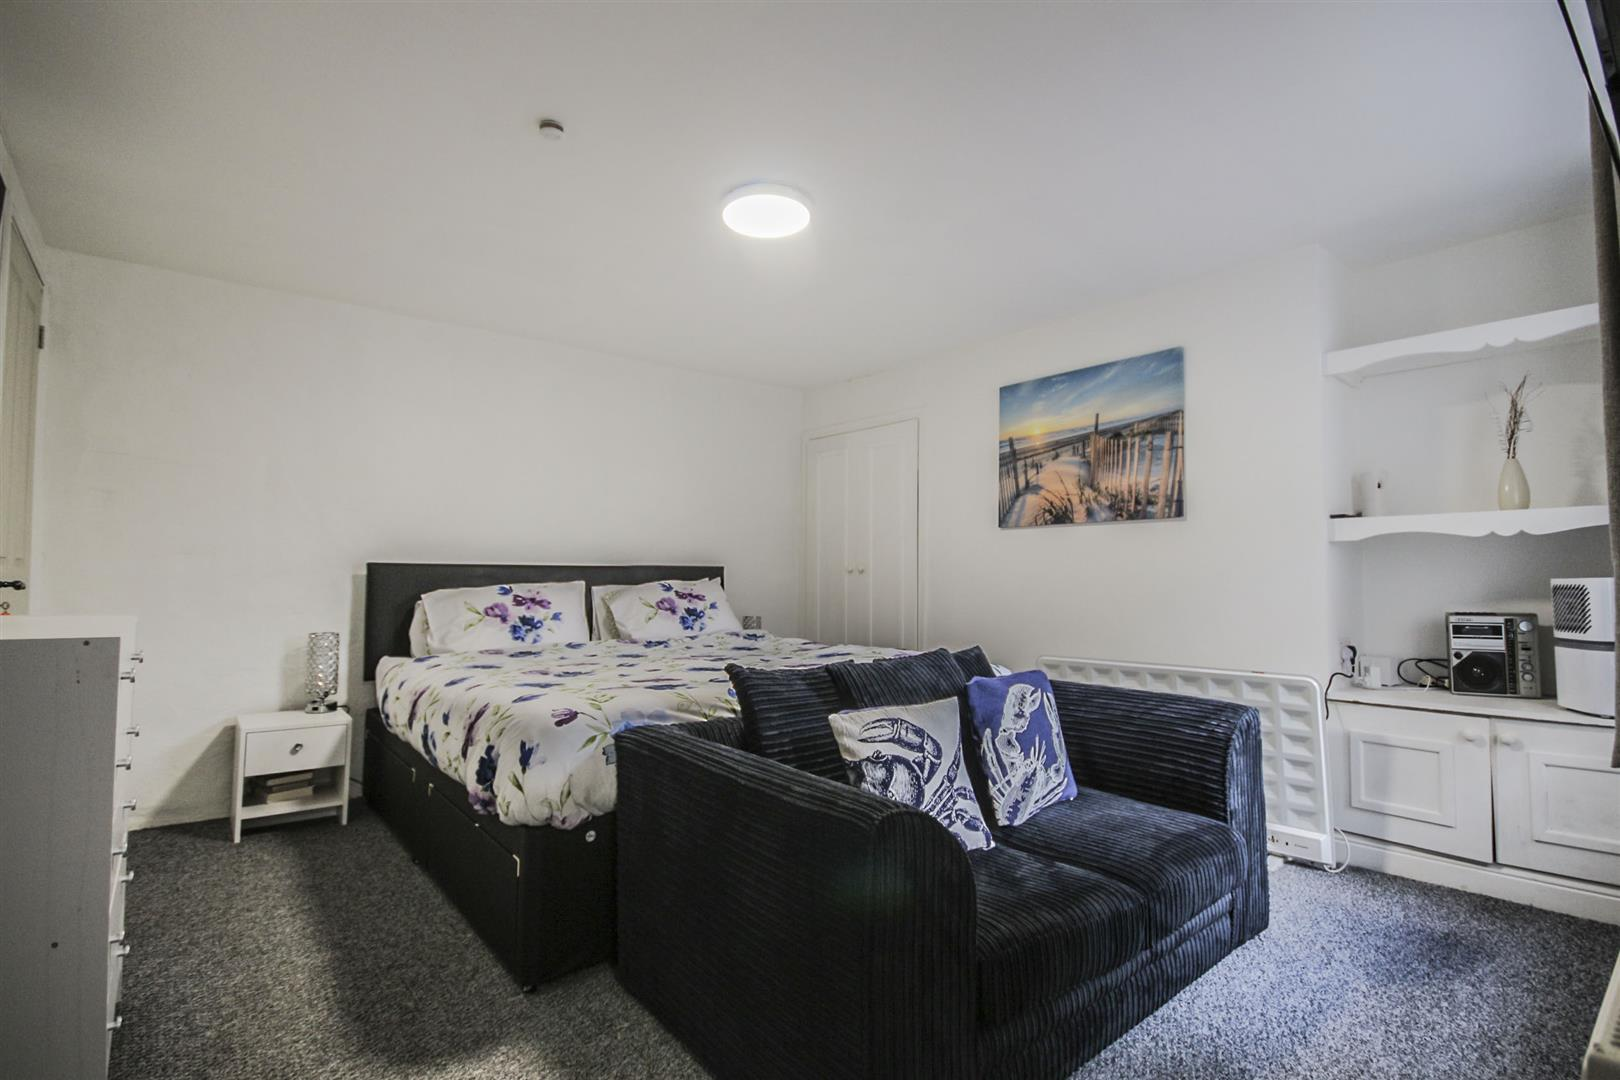 5 Bedroom Mid Terrace House For Sale - Edit_3.jpg